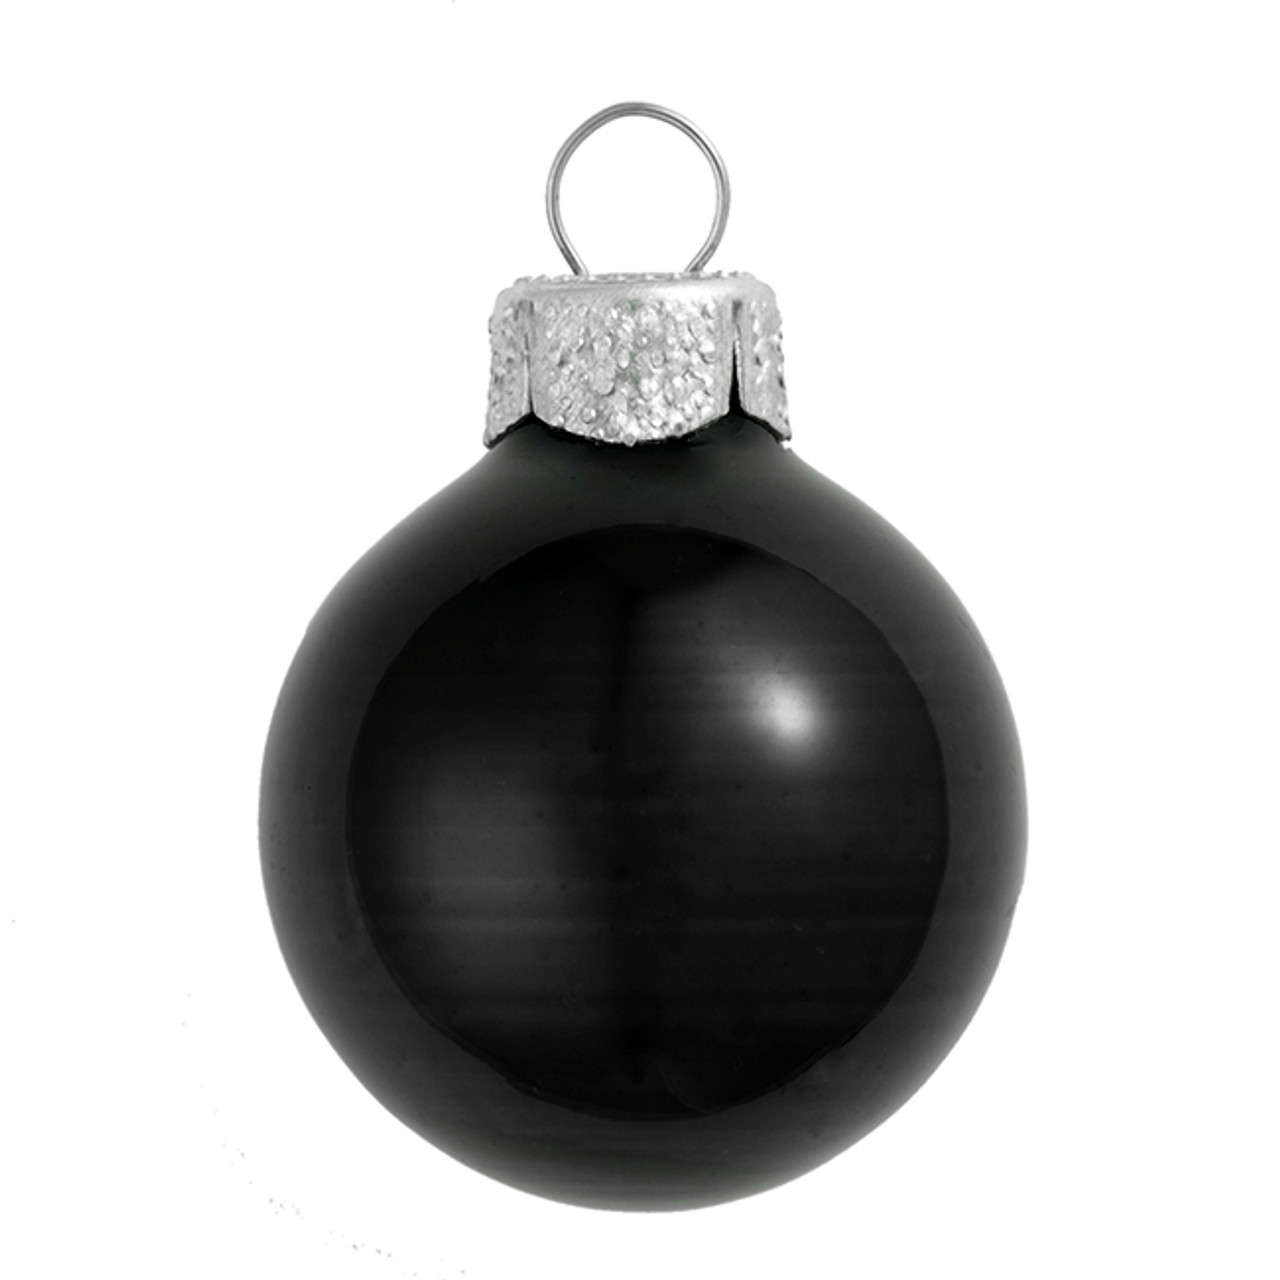 Black Christmas Balls.4ct Shiny Black Glass Ball Christmas Ornaments 4 75 120mm 30939960